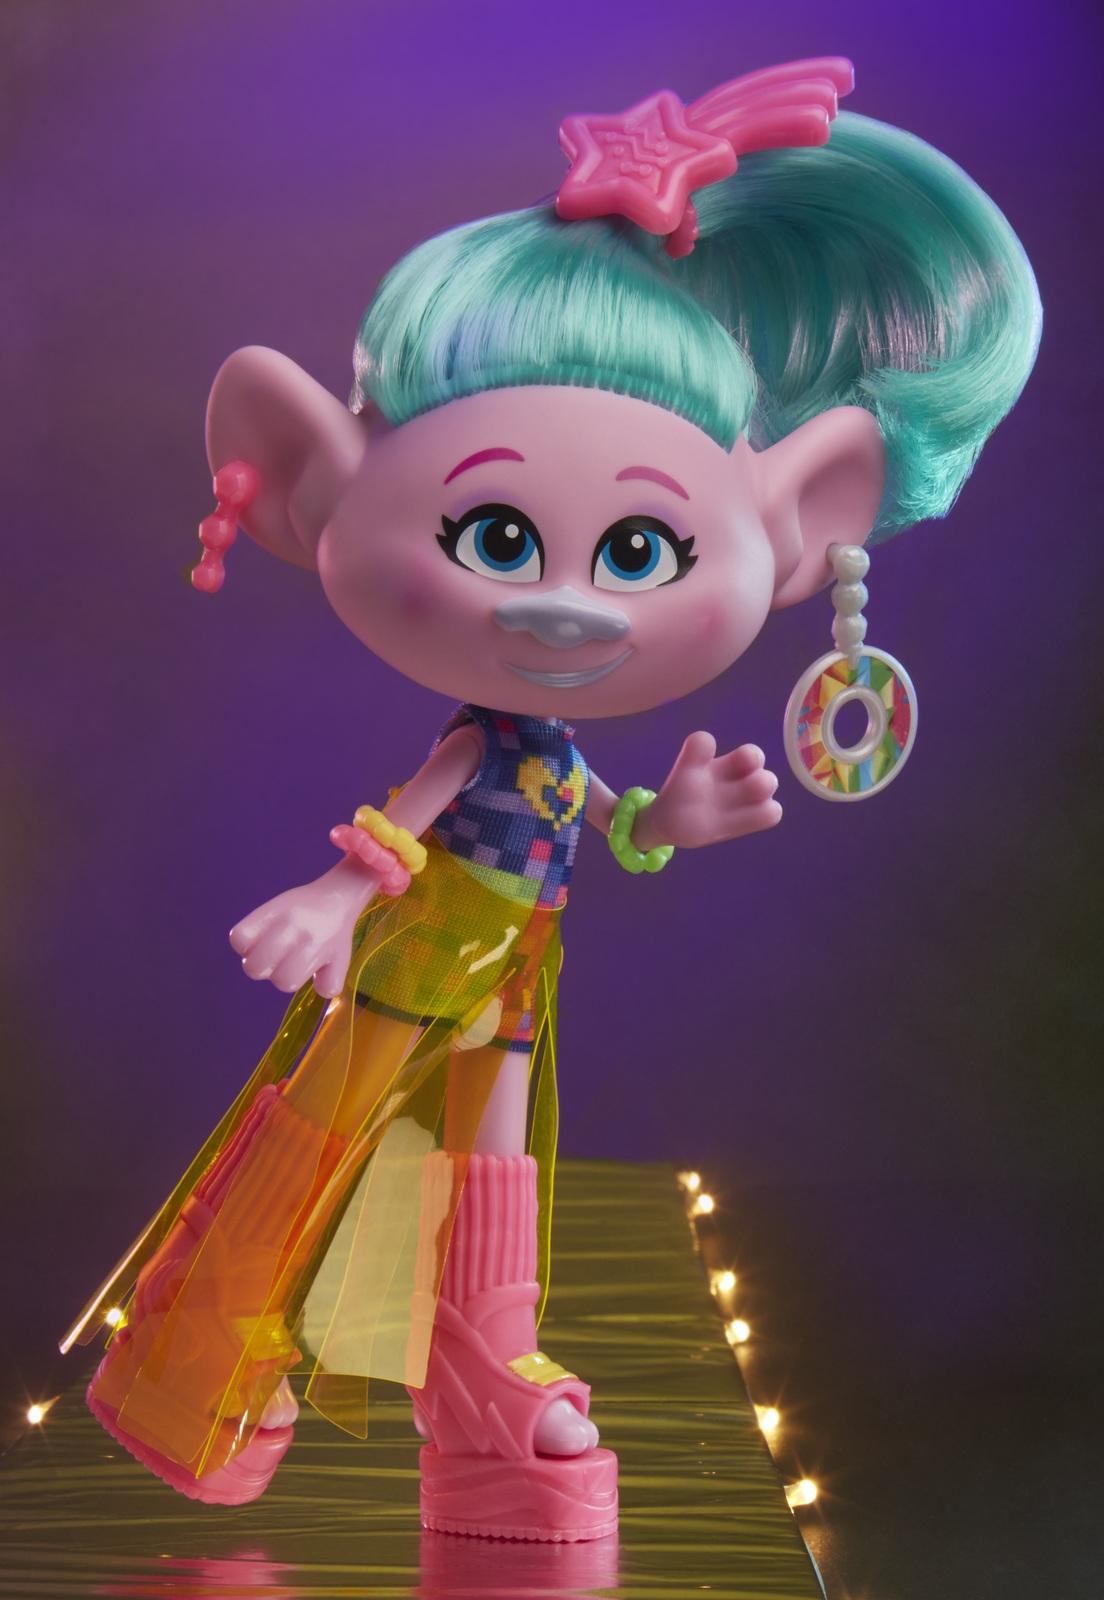 Trolls World Tour Glam Satin Deluxe Fashion Doll